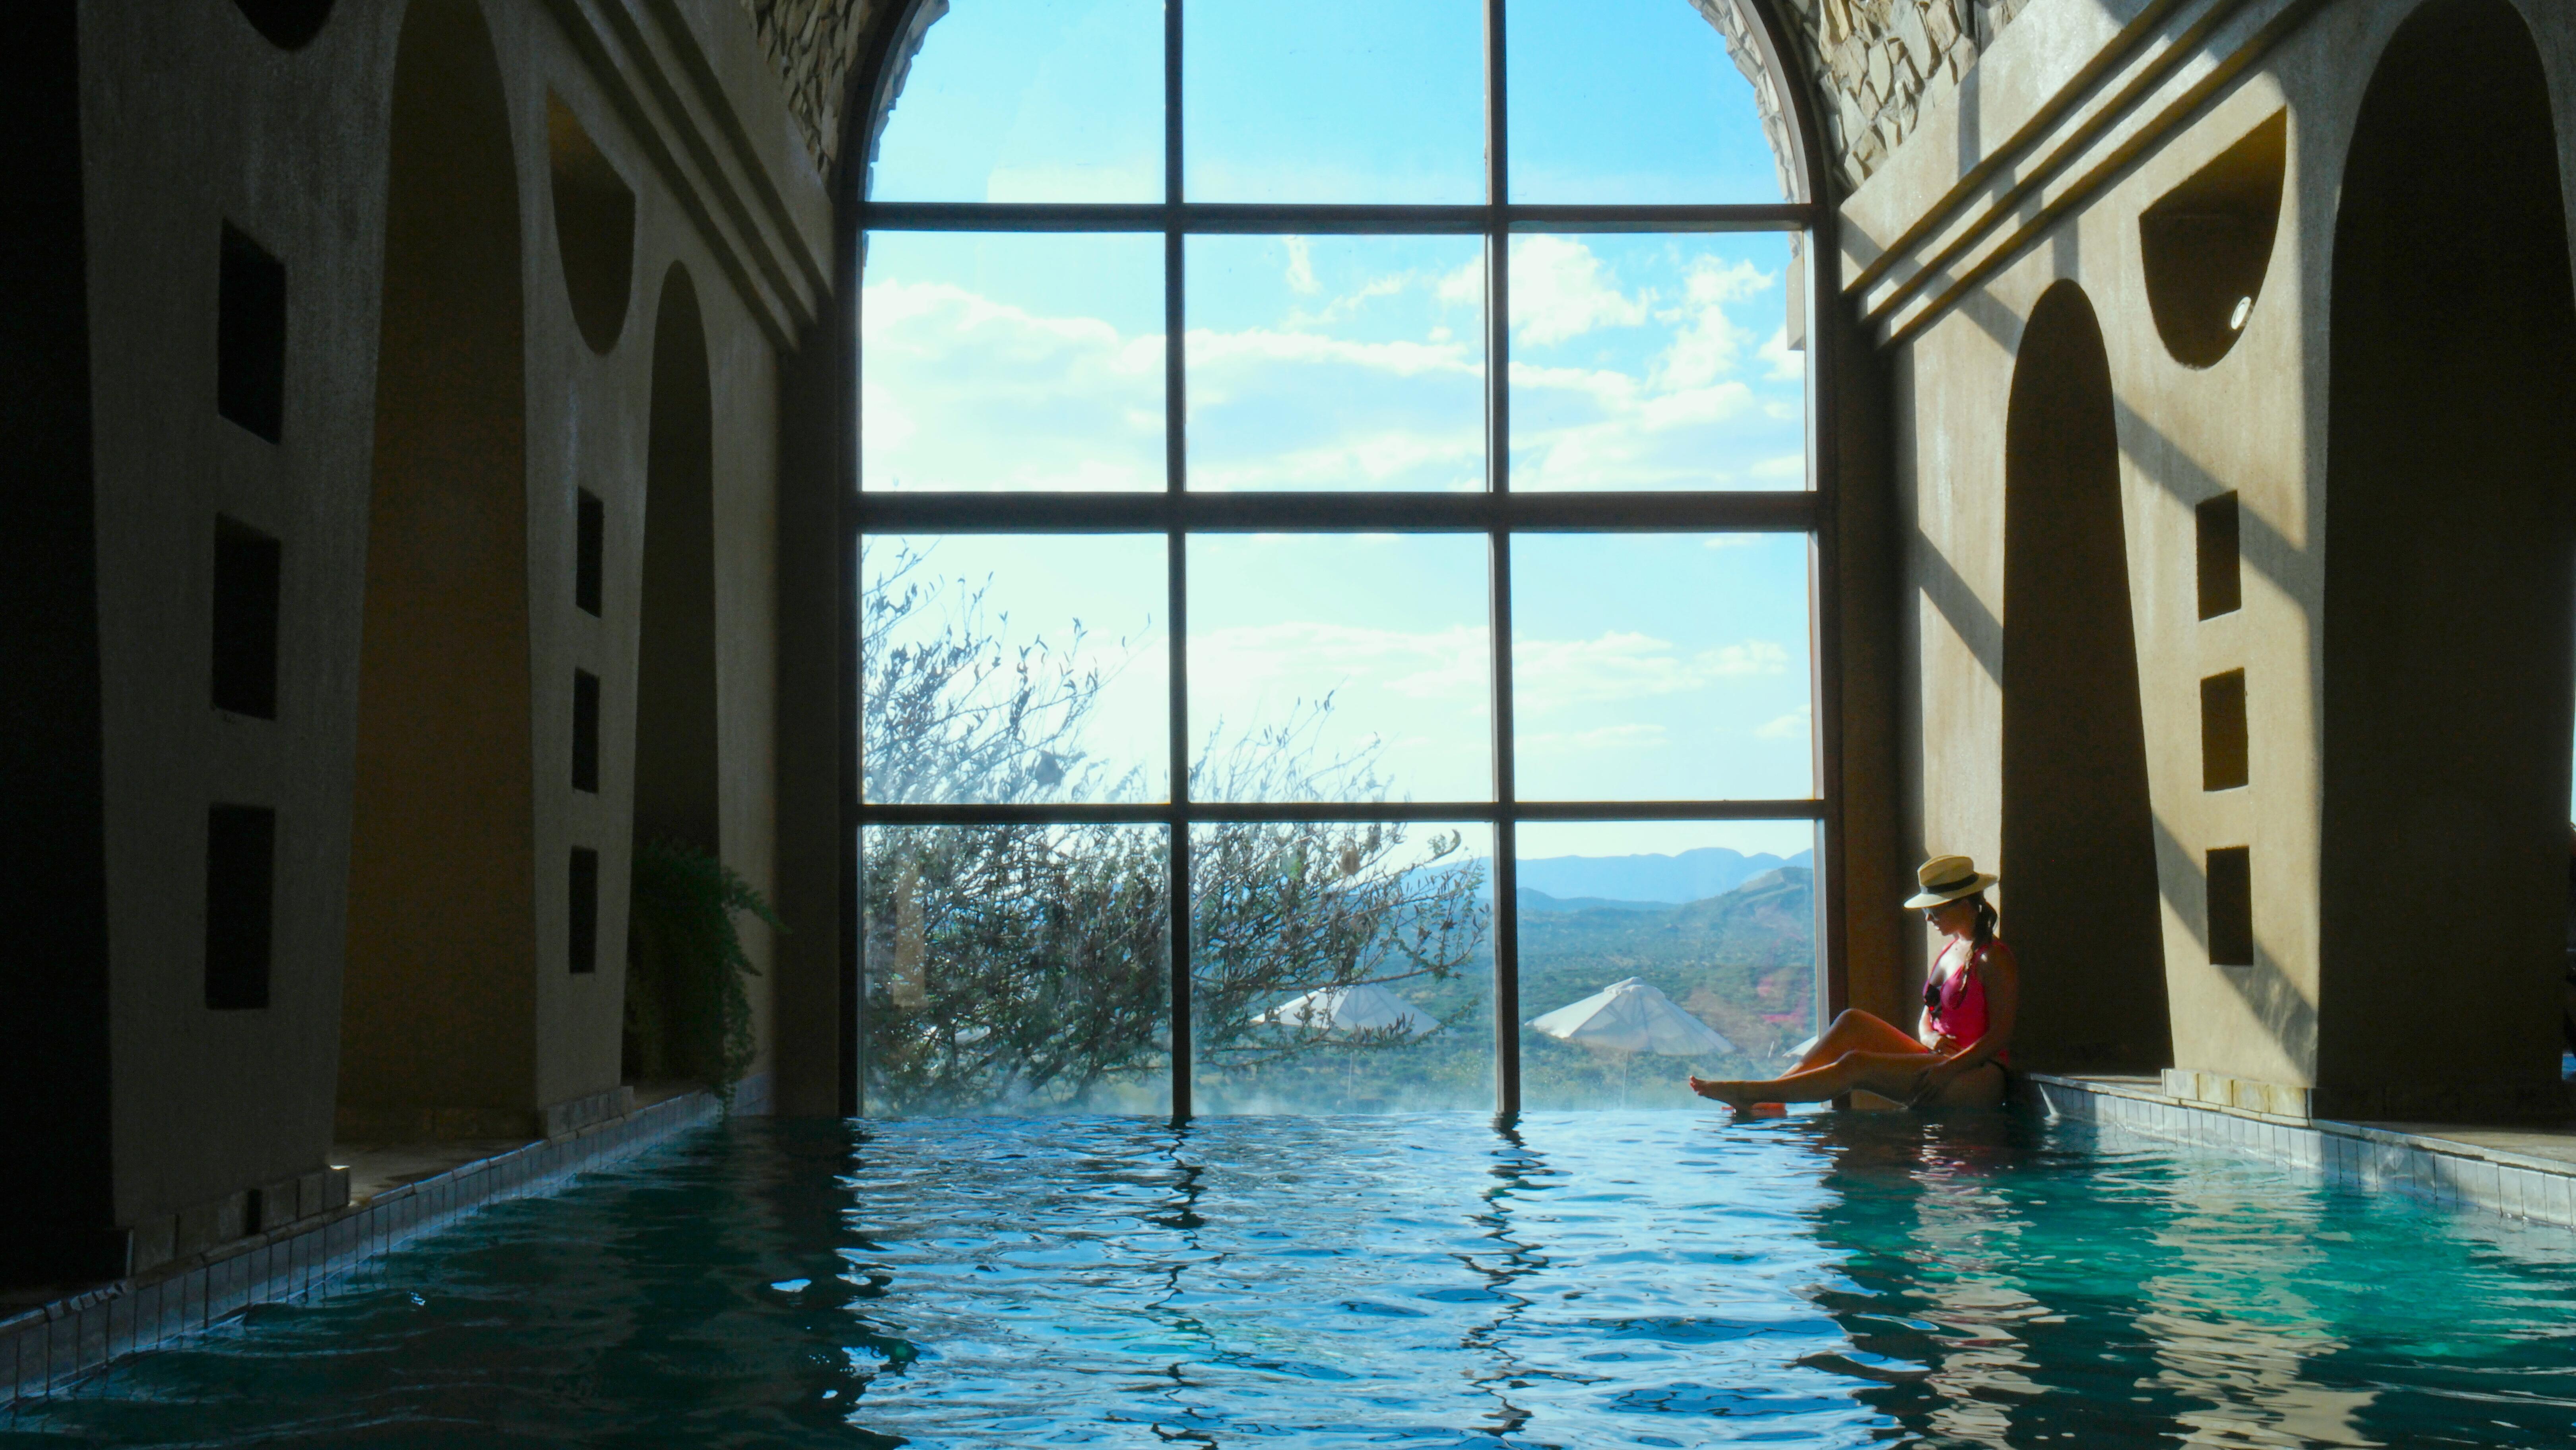 gocheganas-luxury-spa-windhoek-namibia-lustforthesublime